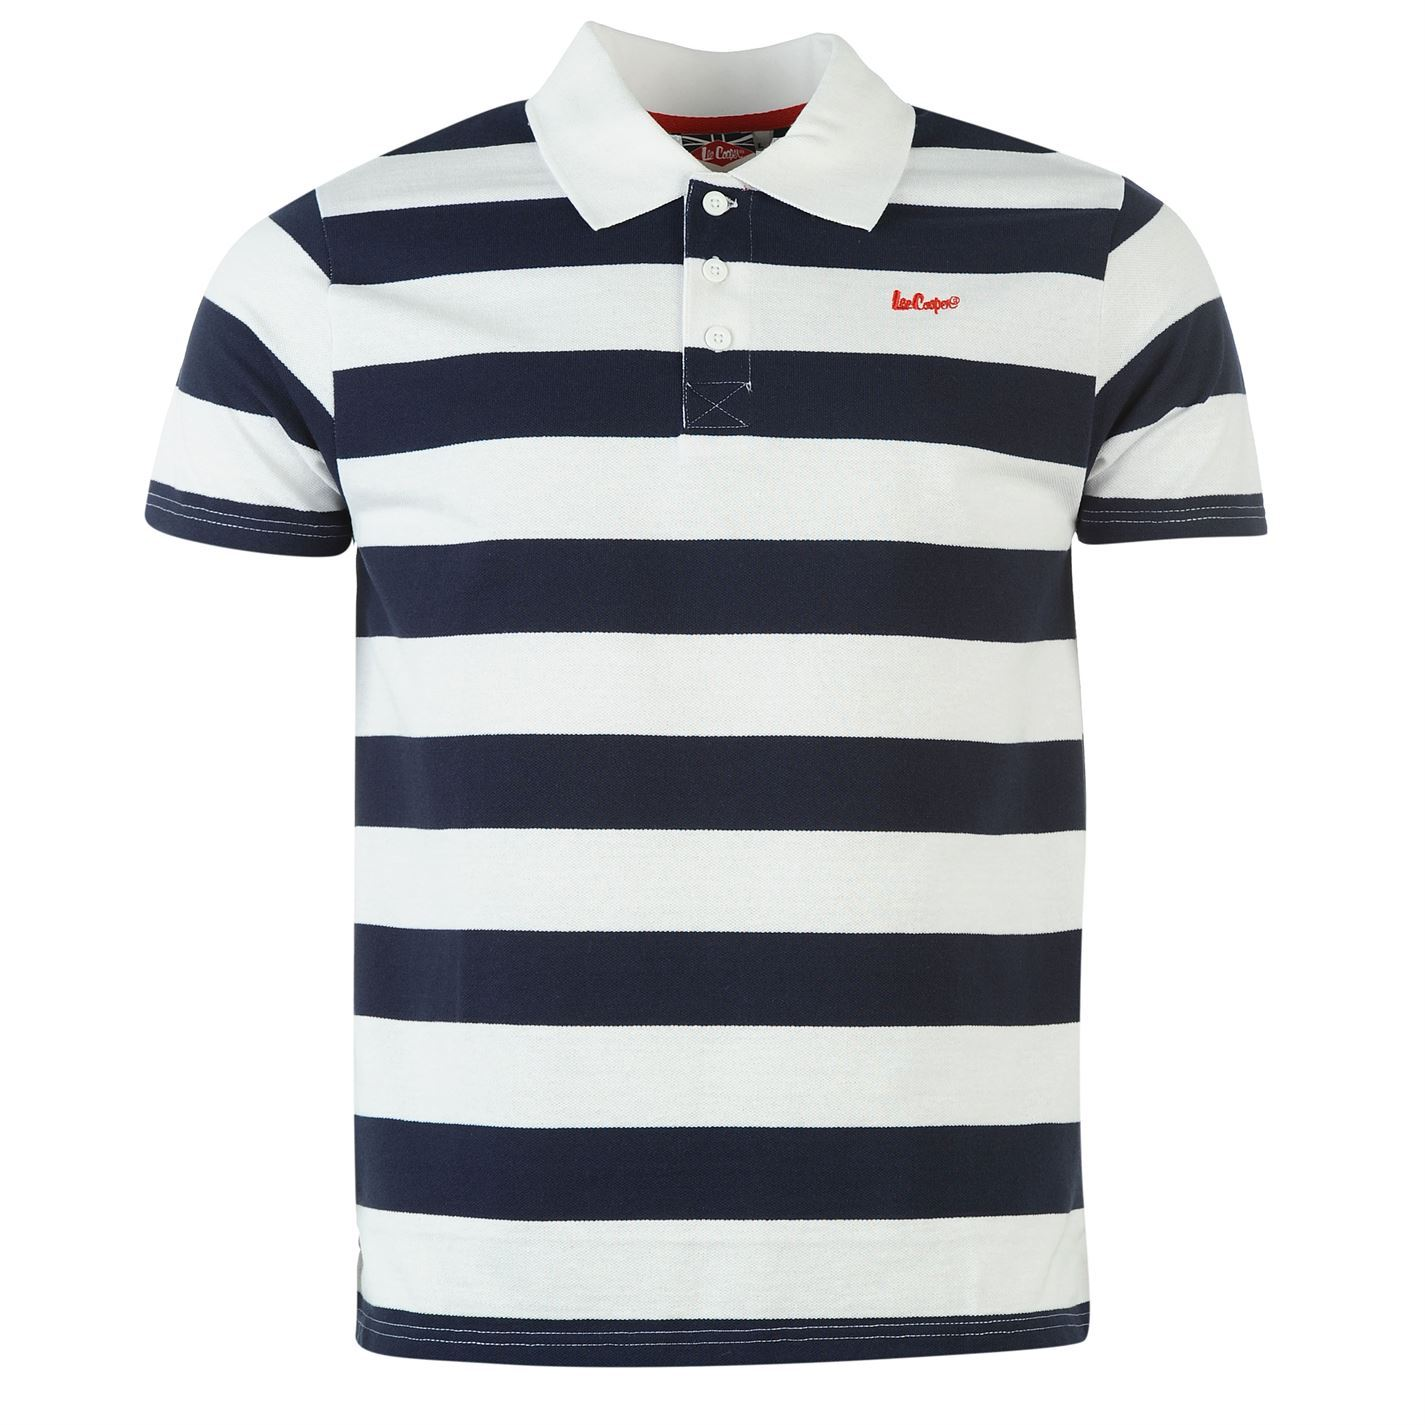 Lee cooper mens c stripe polo 3 button collar short sleeve for Button collar t shirt